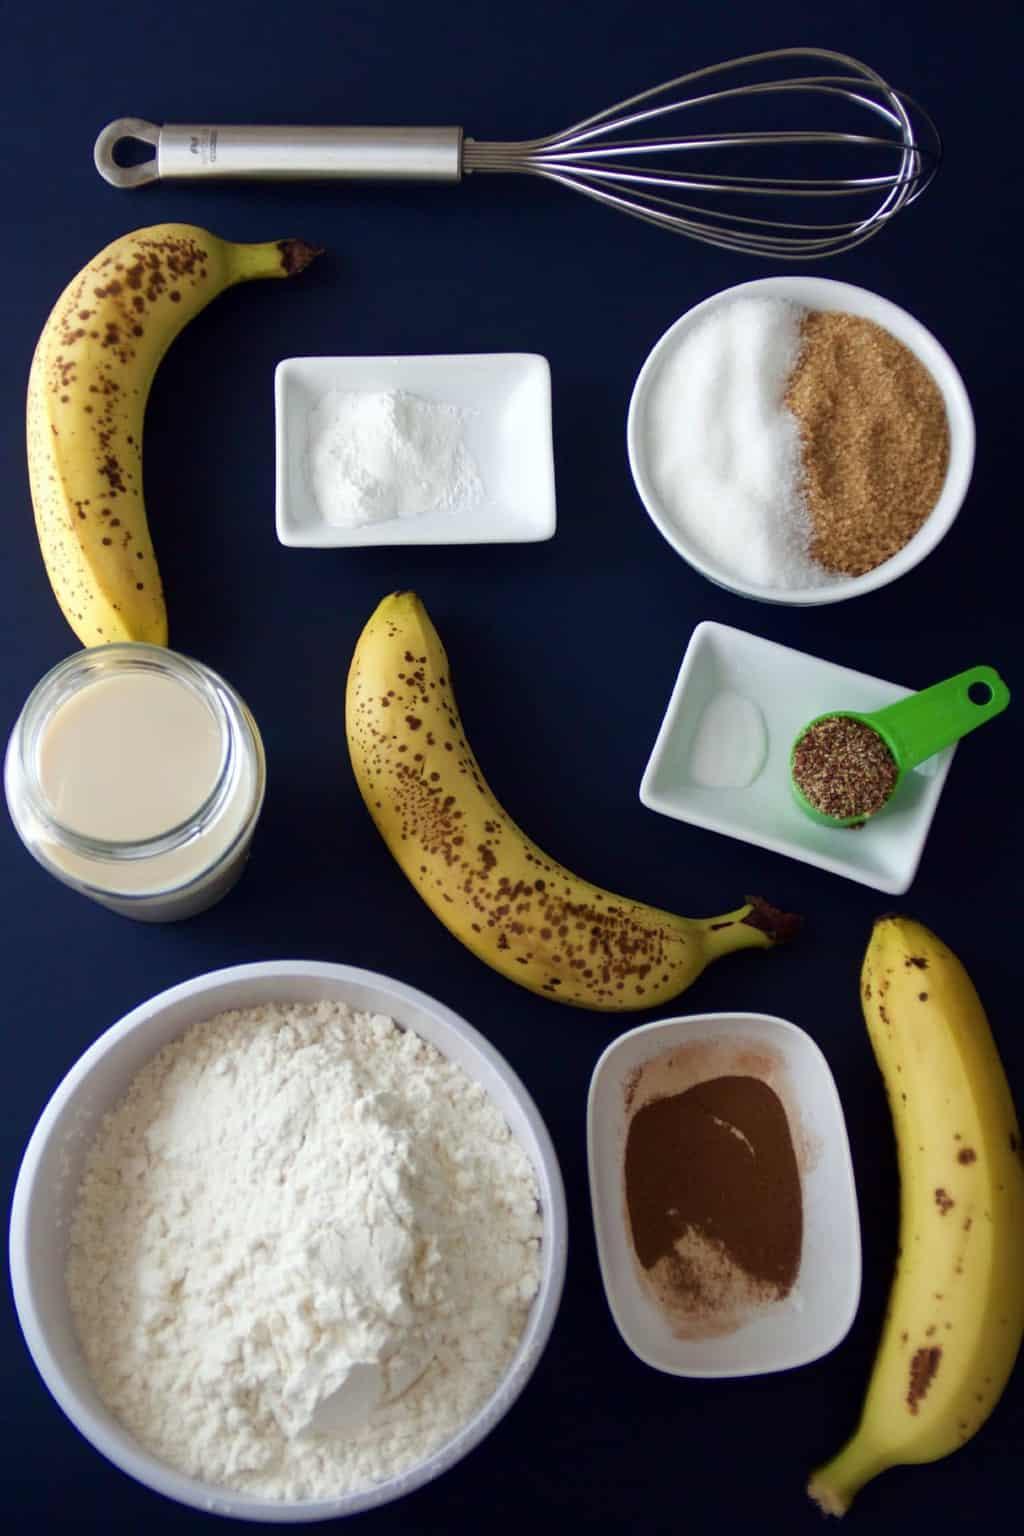 Vegan Banana Bread Ingredients #vegan #bananabread